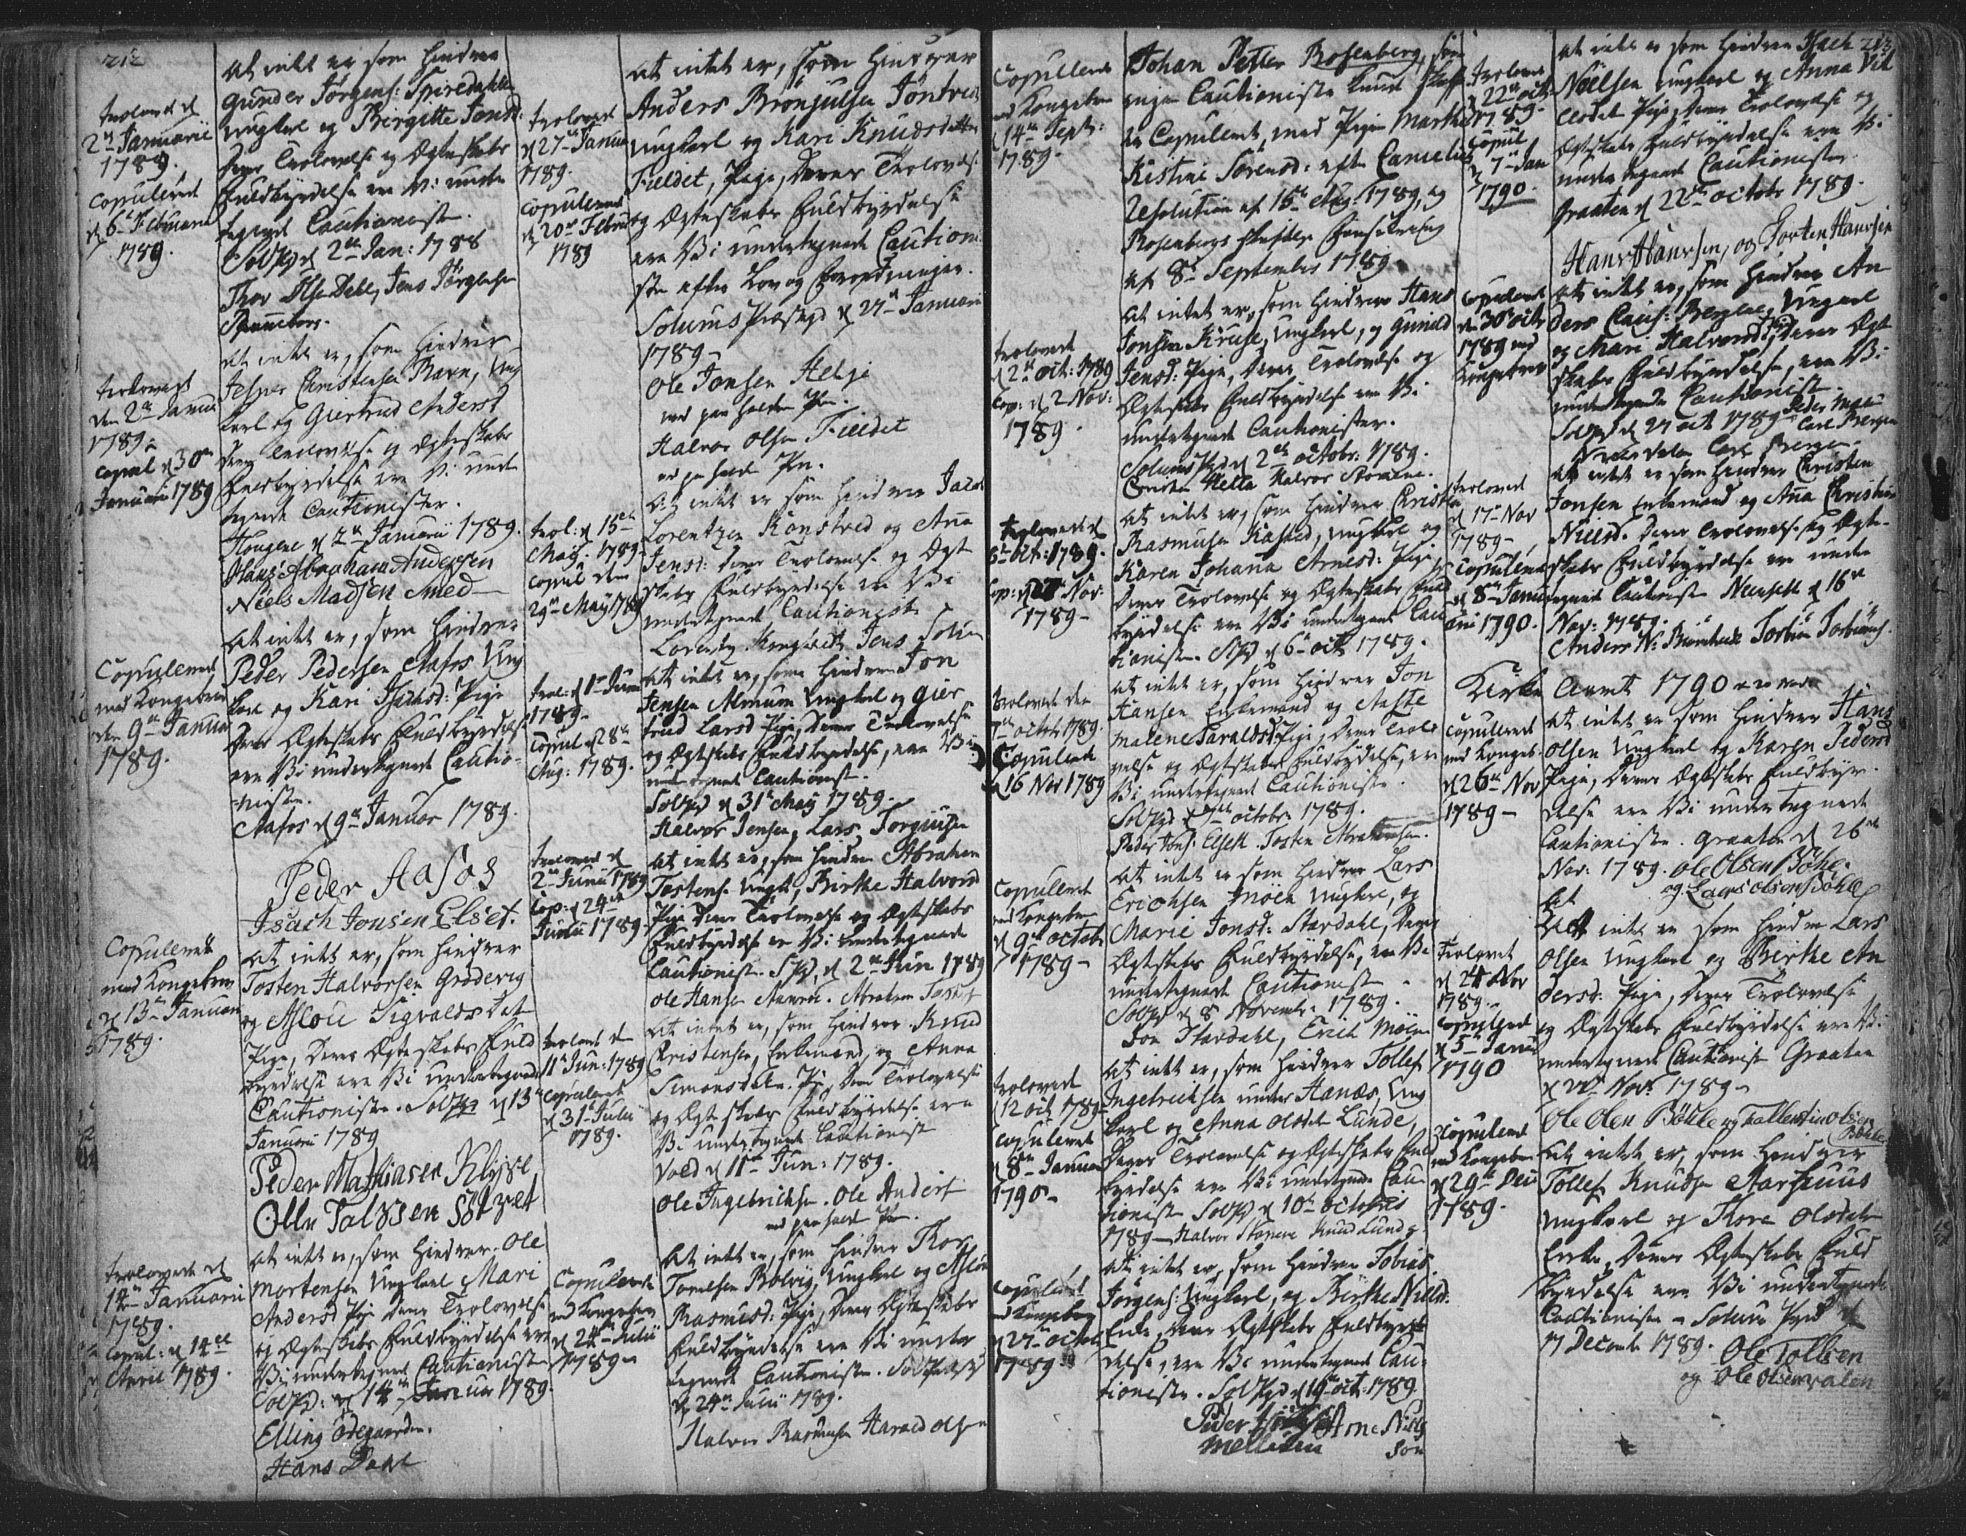 SAKO, Solum kirkebøker, F/Fa/L0003: Ministerialbok nr. I 3, 1761-1814, s. 212-213